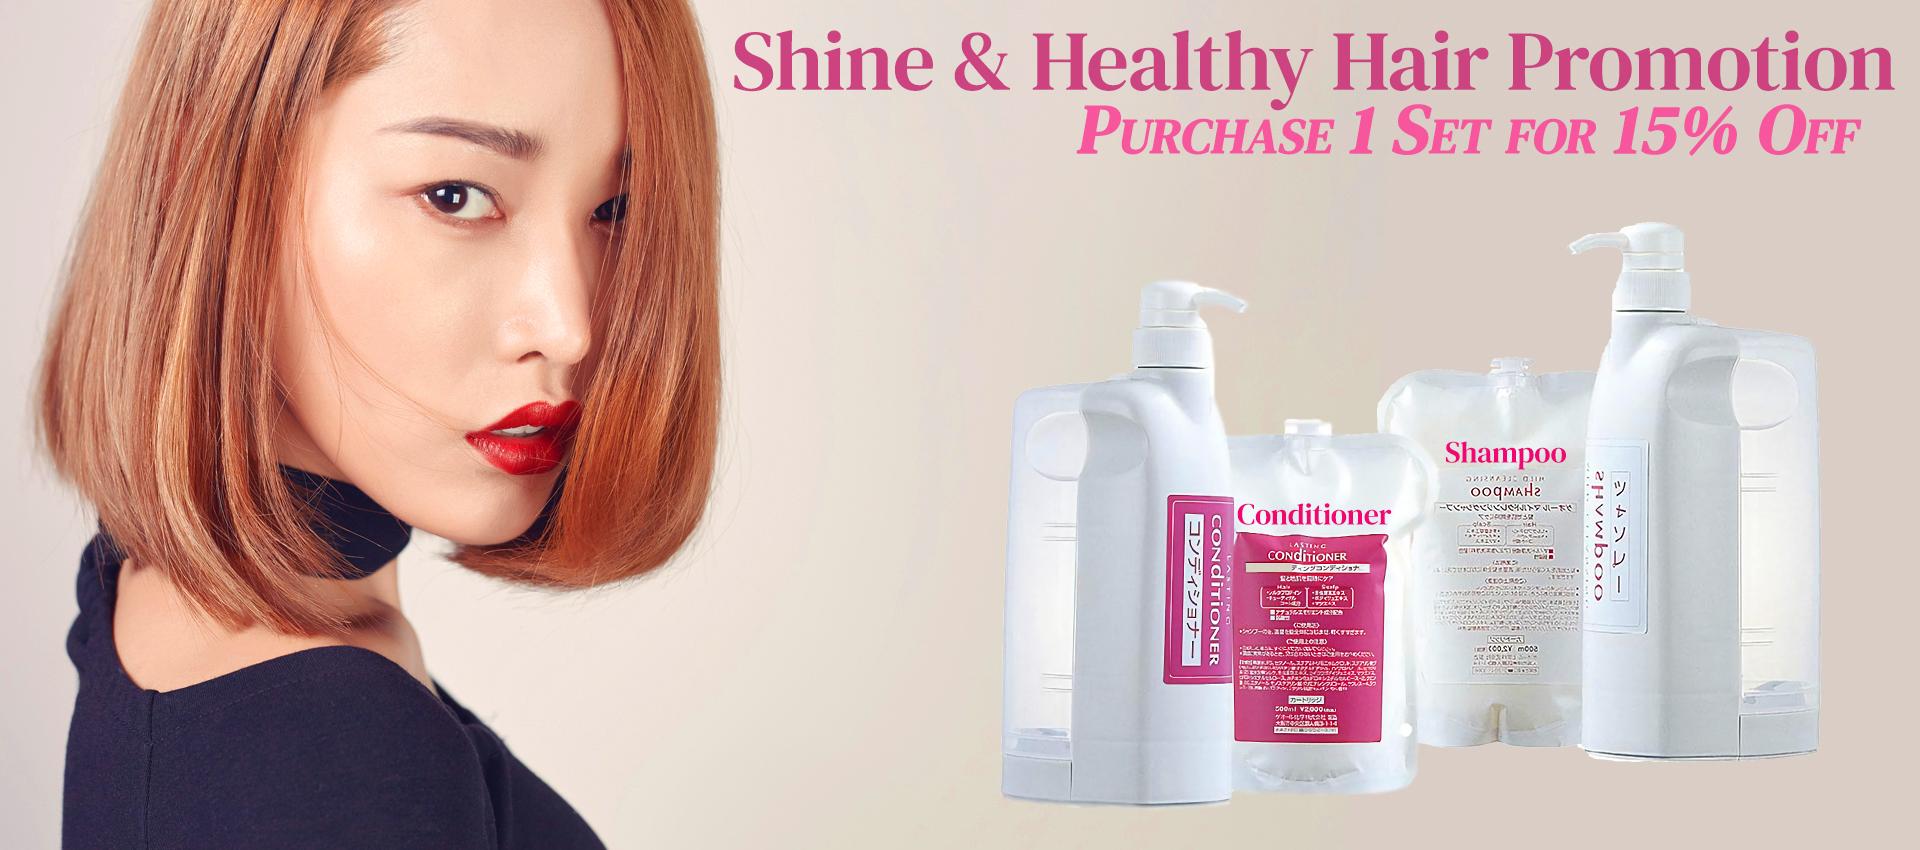 Geol Shampoo & Conditioner Set Promotion